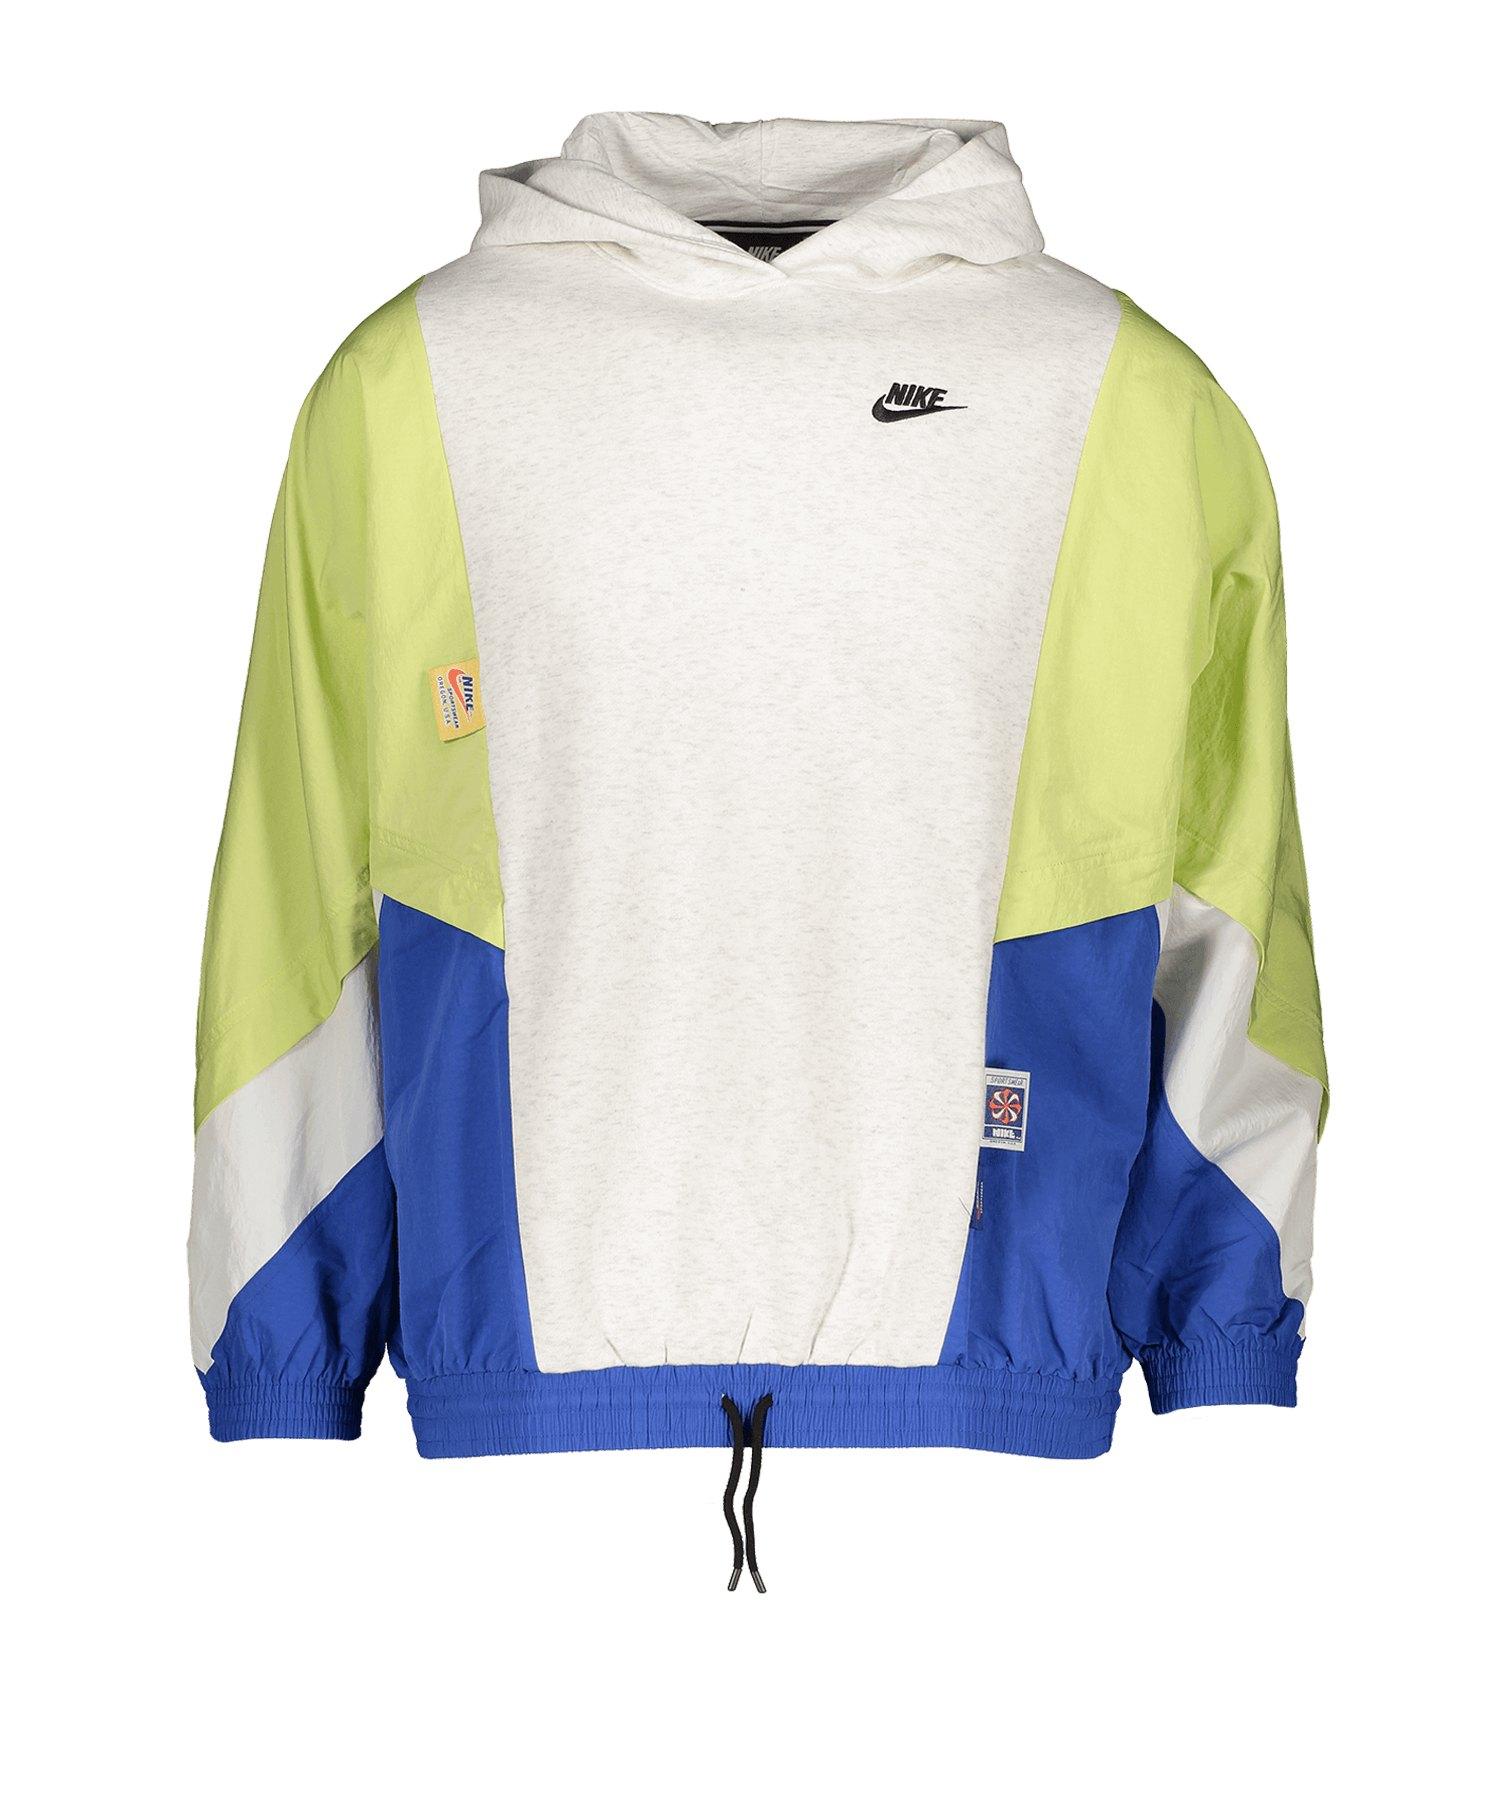 Nike Fleece Hoody Kapuzenpullover Weiss F051 - weiss